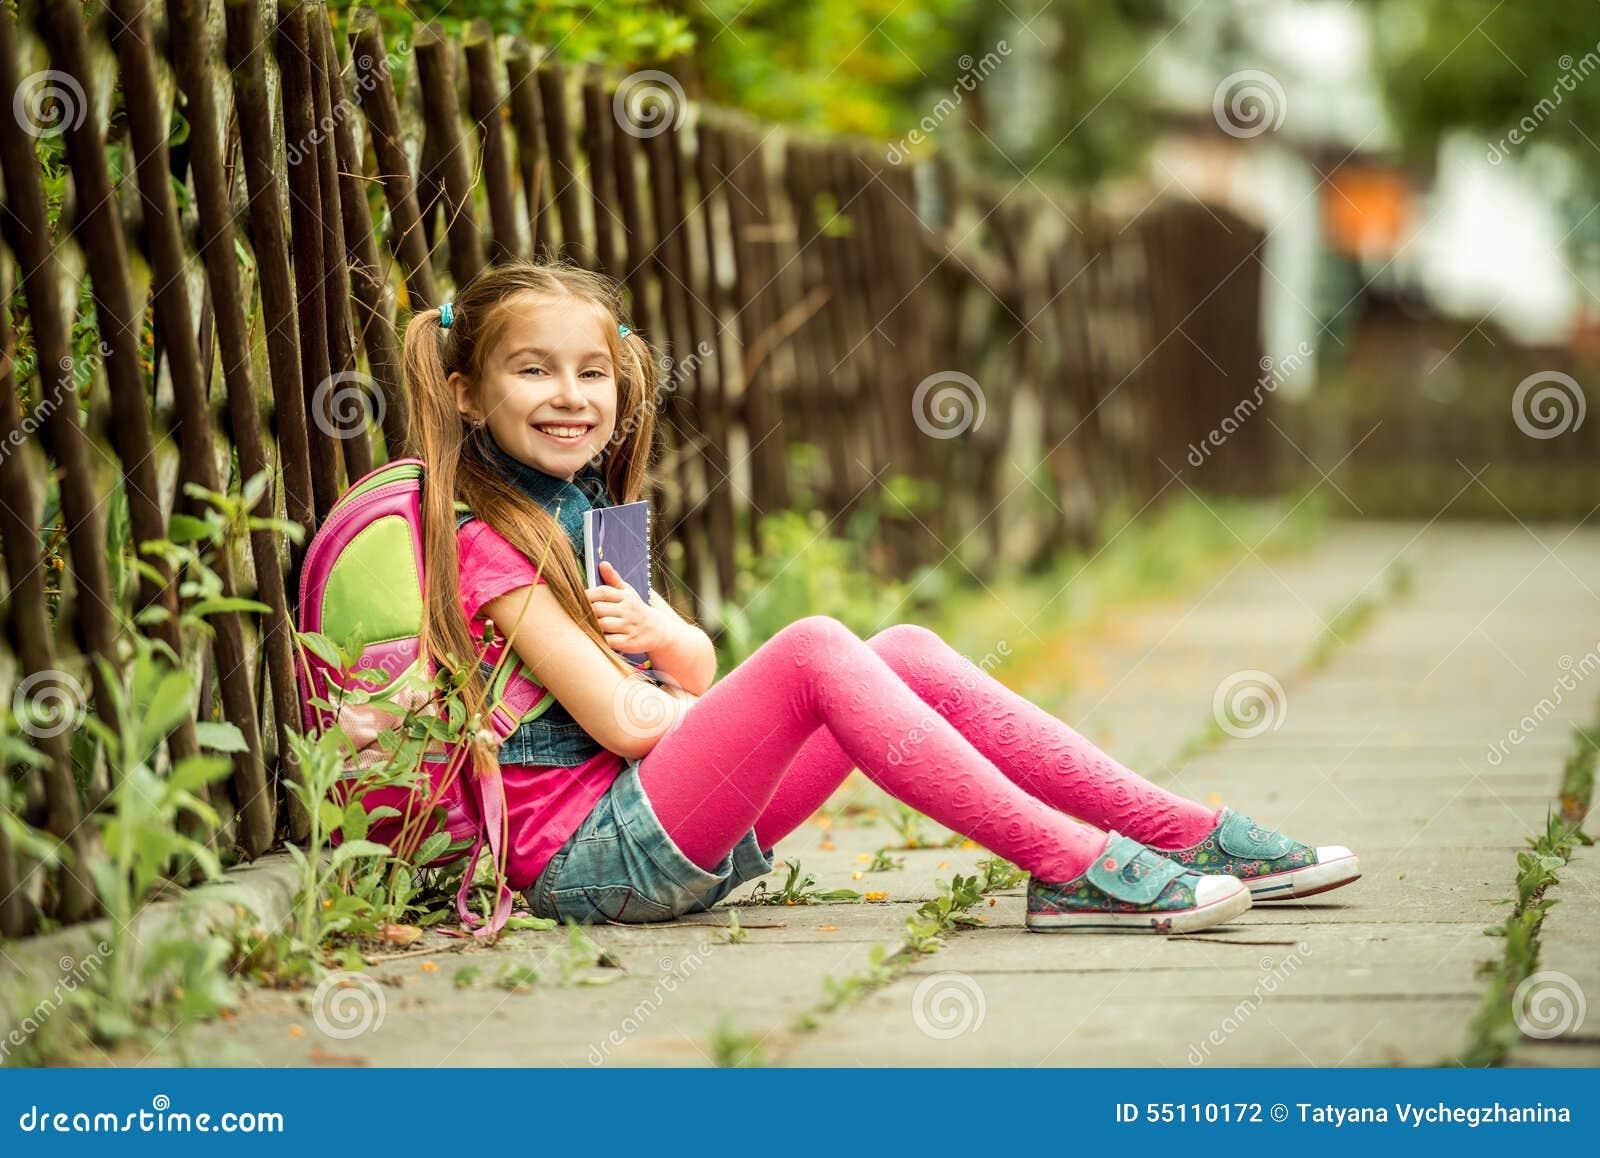 Schoolgirl Reading A Book On The Street Stock Photo ...